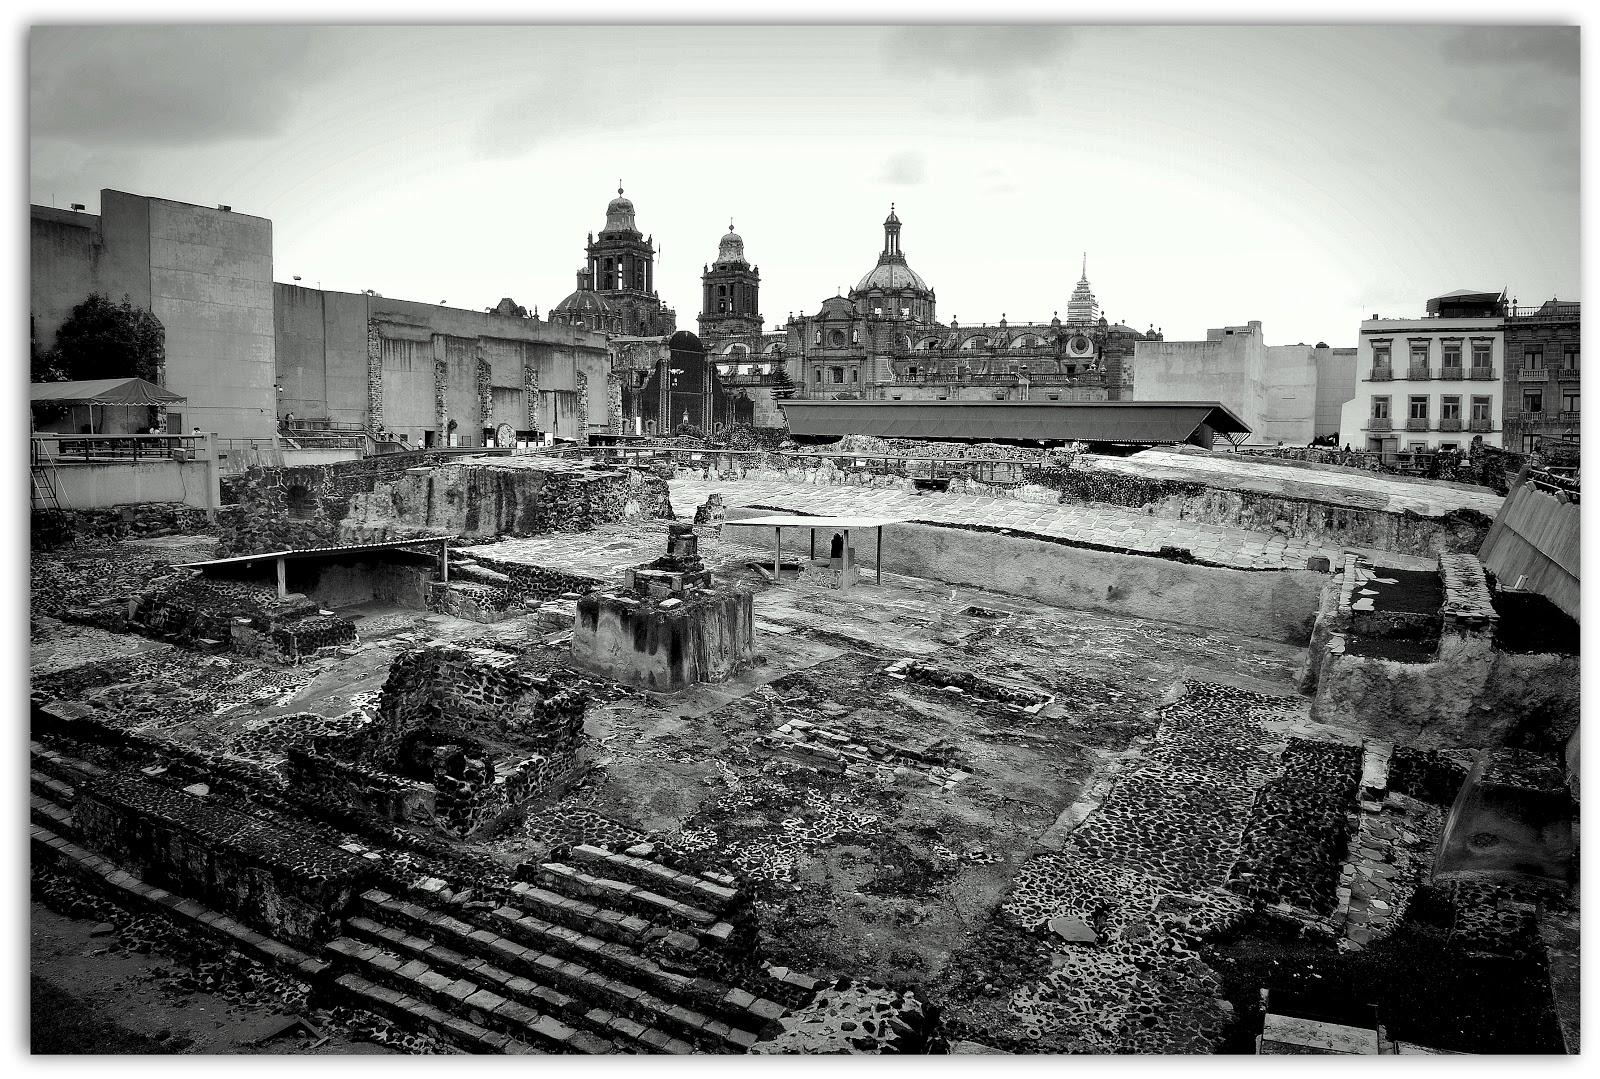 Aztec ruins in Tenochtitlan. Play AZTEC GOLD on 1Up Casino ...  |Tenochtitlan Ruins